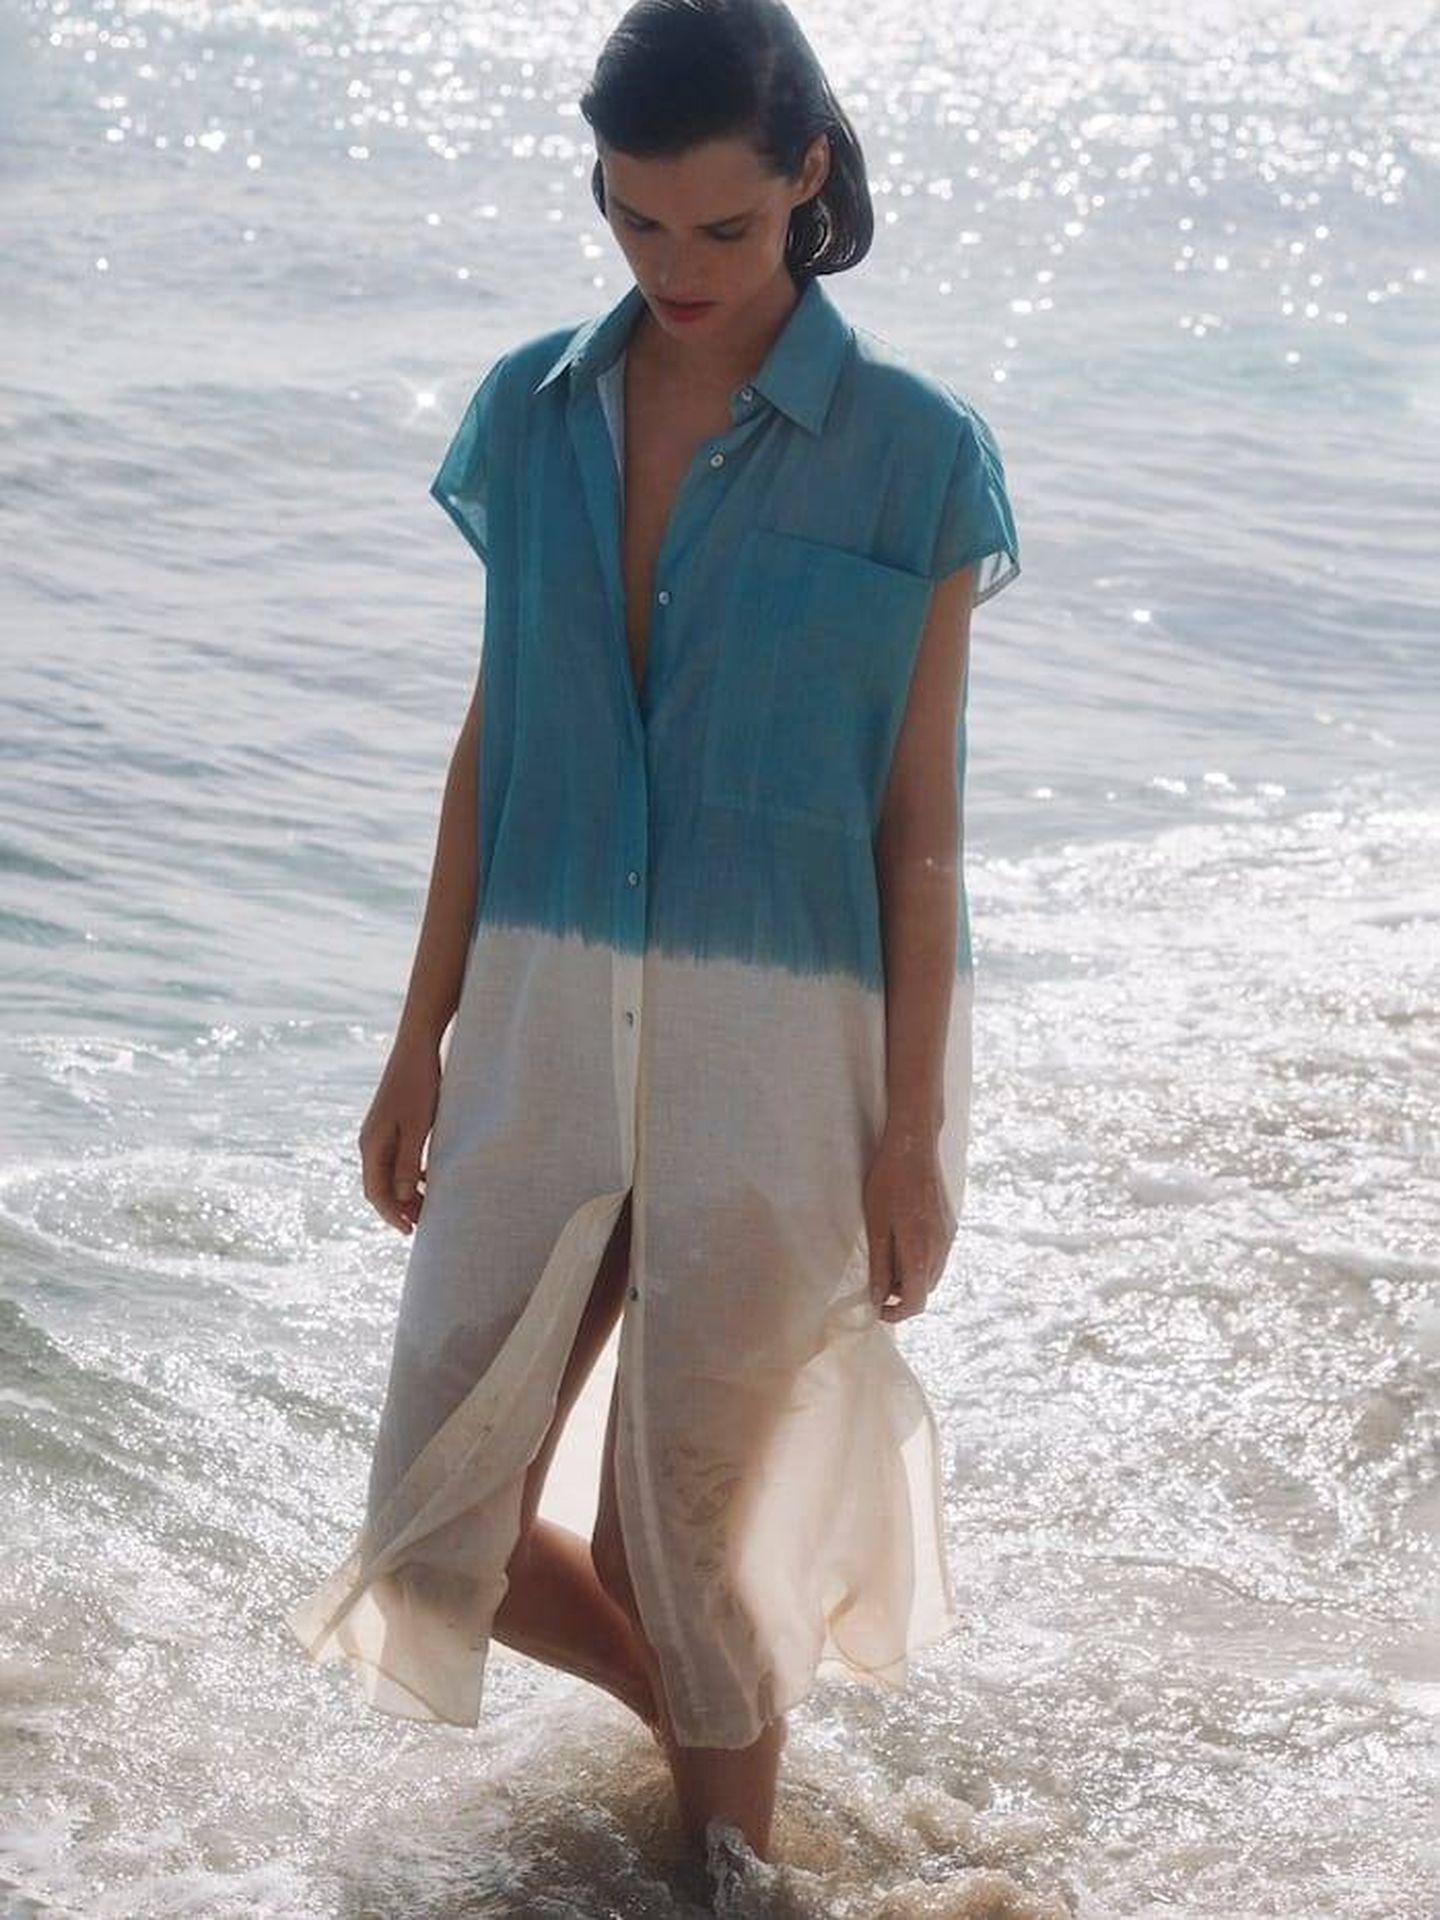 Vestido tie-dye de Massimo Dutti. (Cortesía)